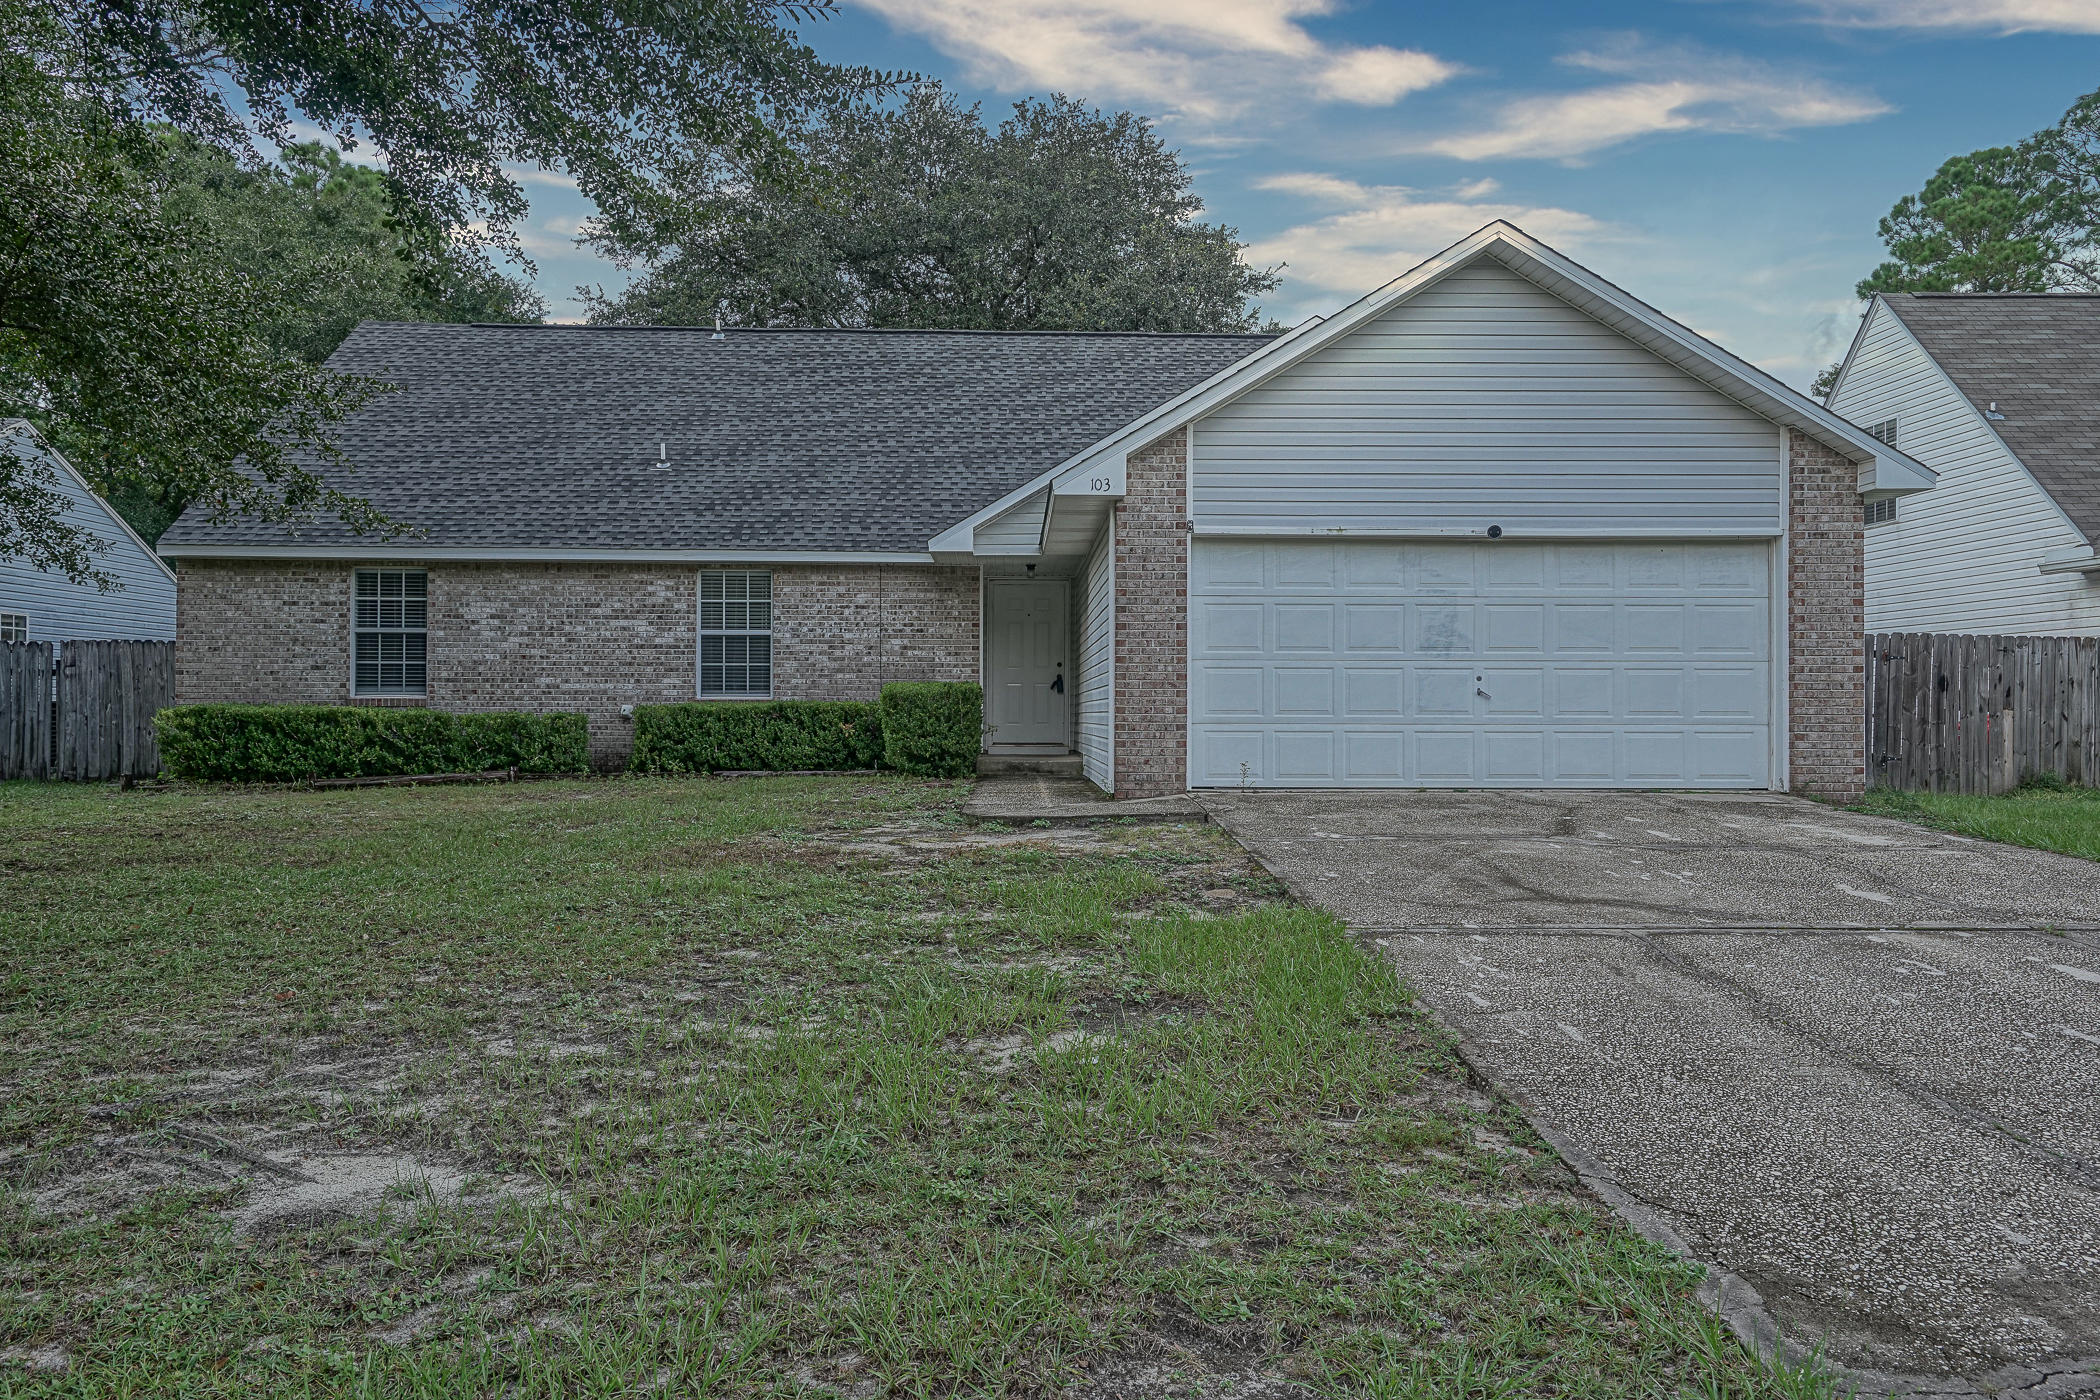 Photo of home for sale at 103 Trevor, Crestview FL